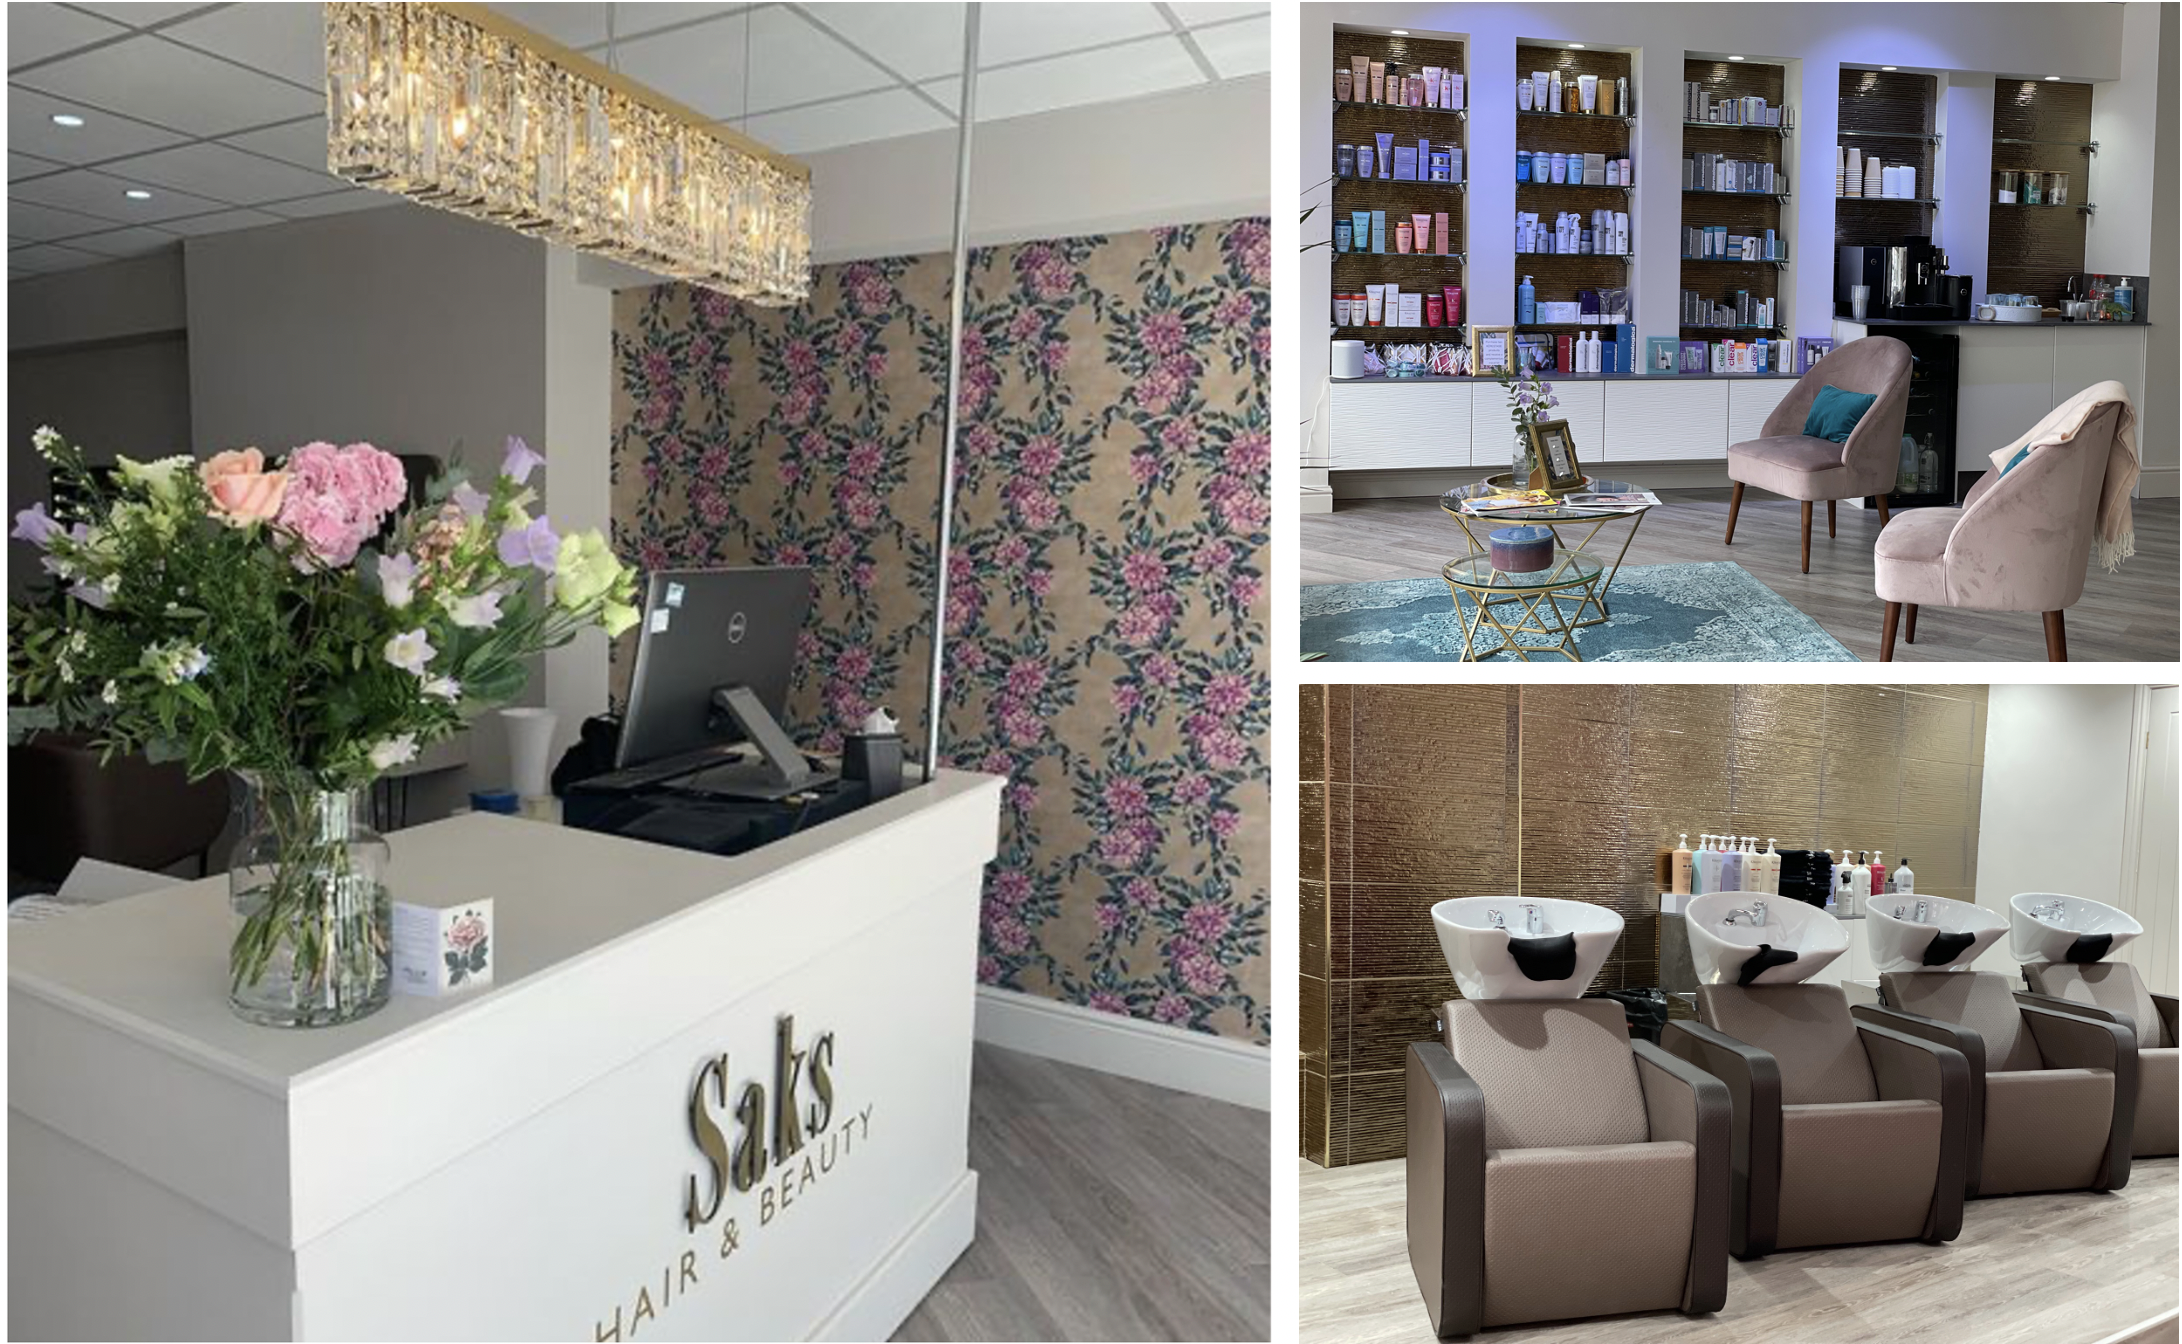 Saks Leeds City salon interior images